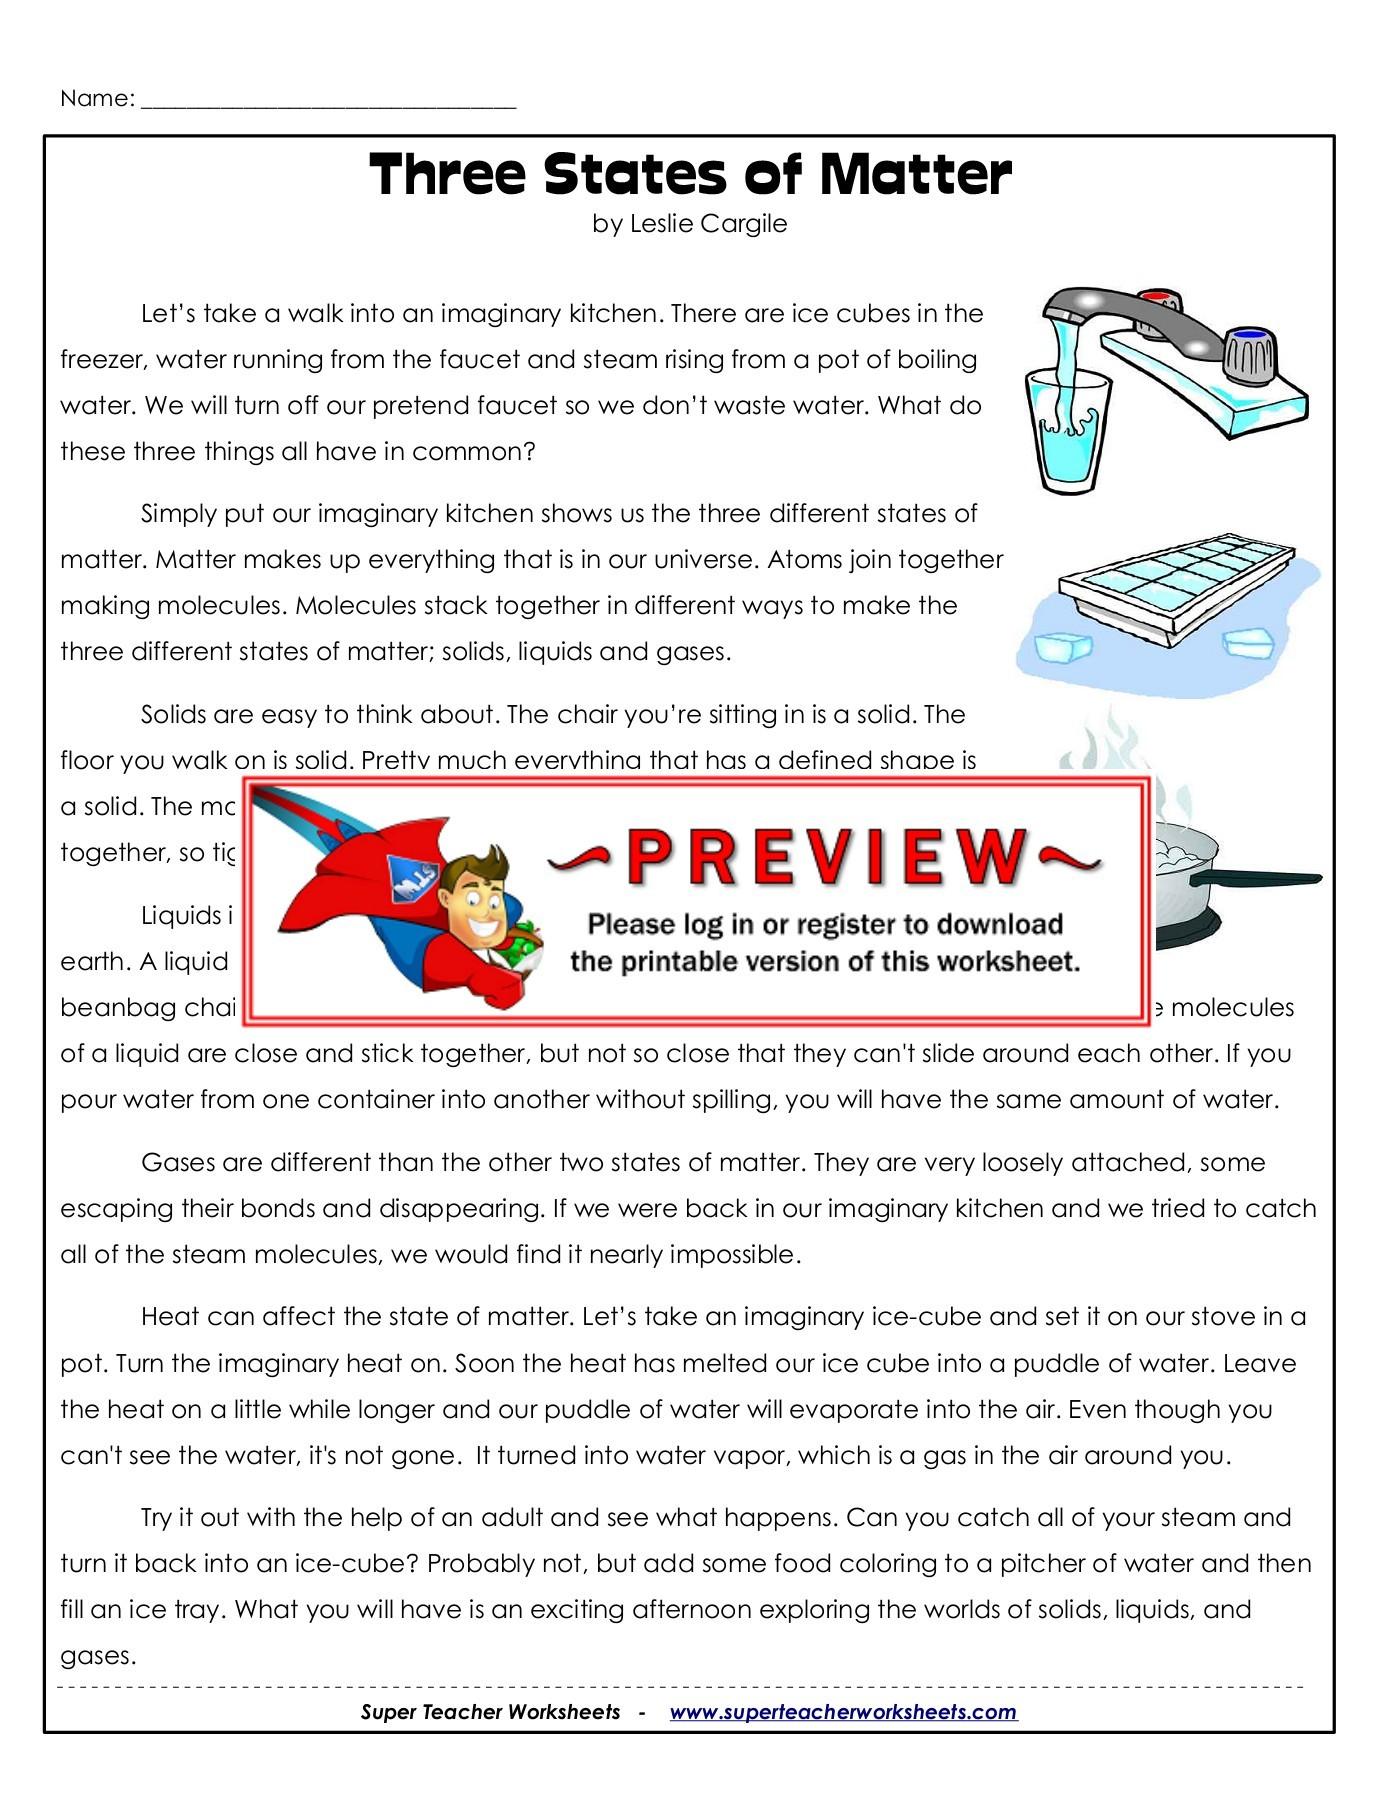 Superteacherworksheets Com